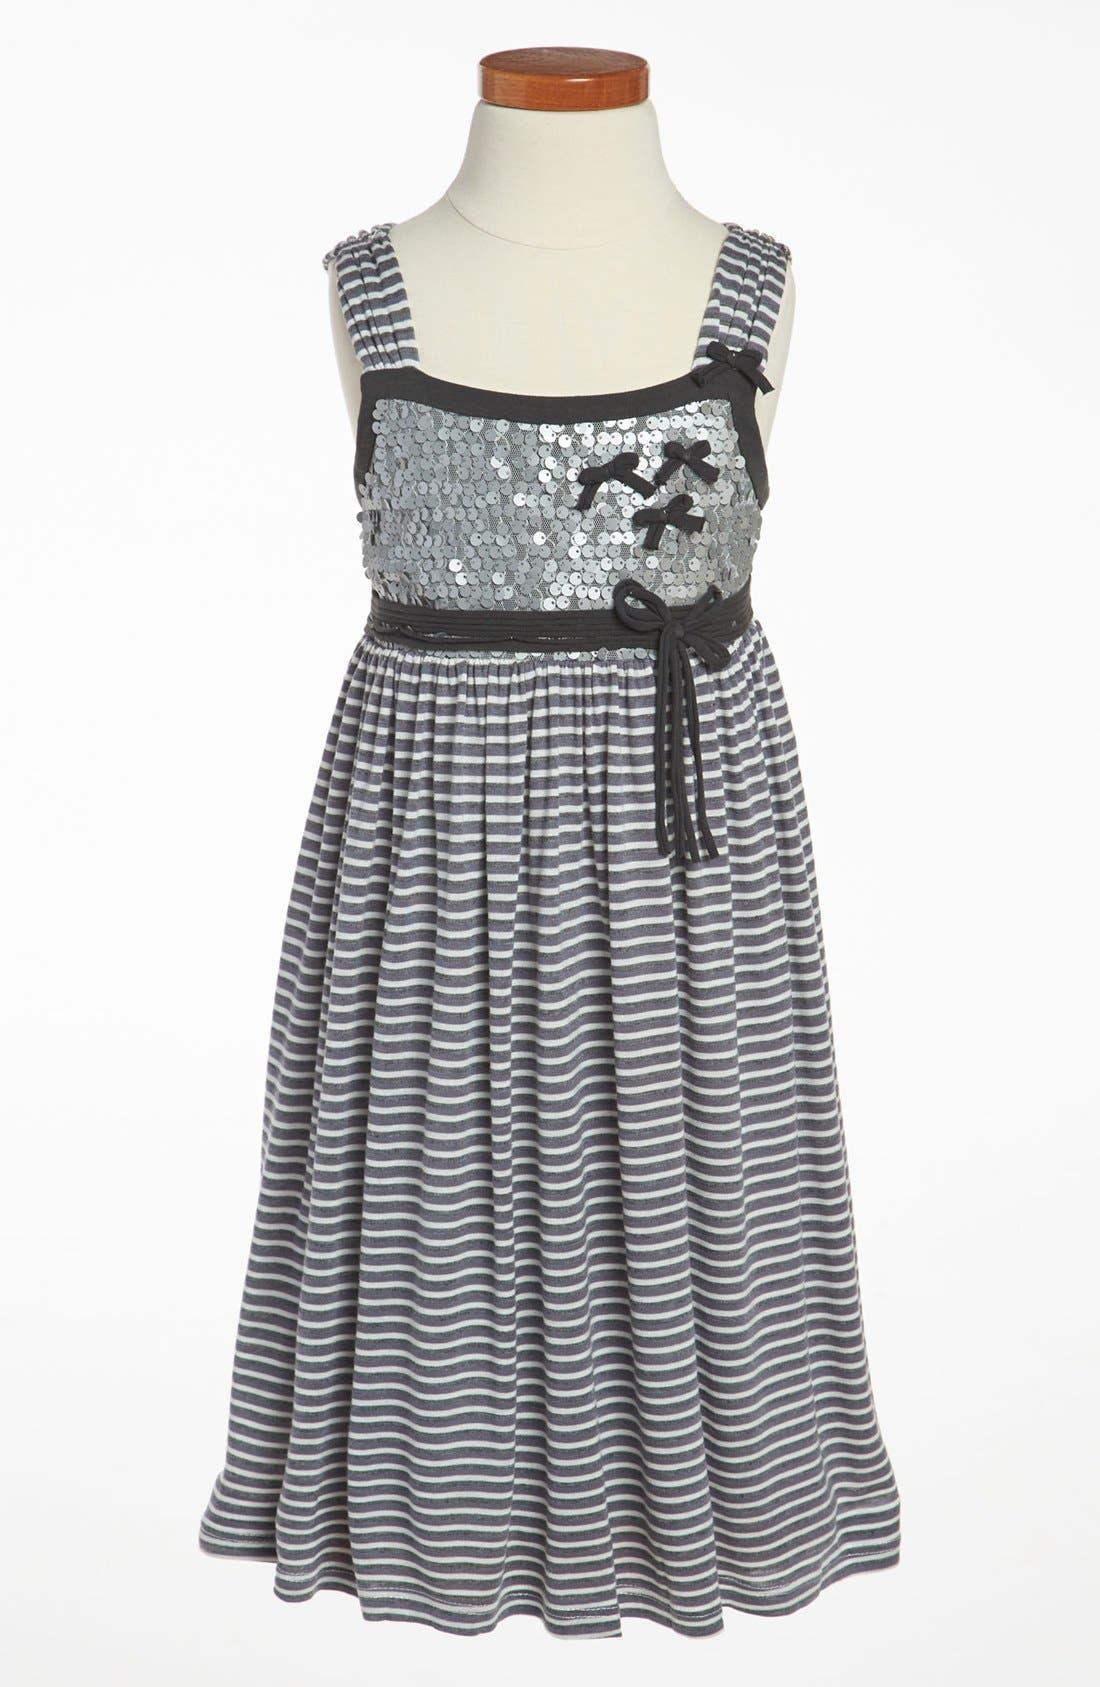 Main Image - Isobella & Chloe Stripe Dress (Little Girls & Big Girls)